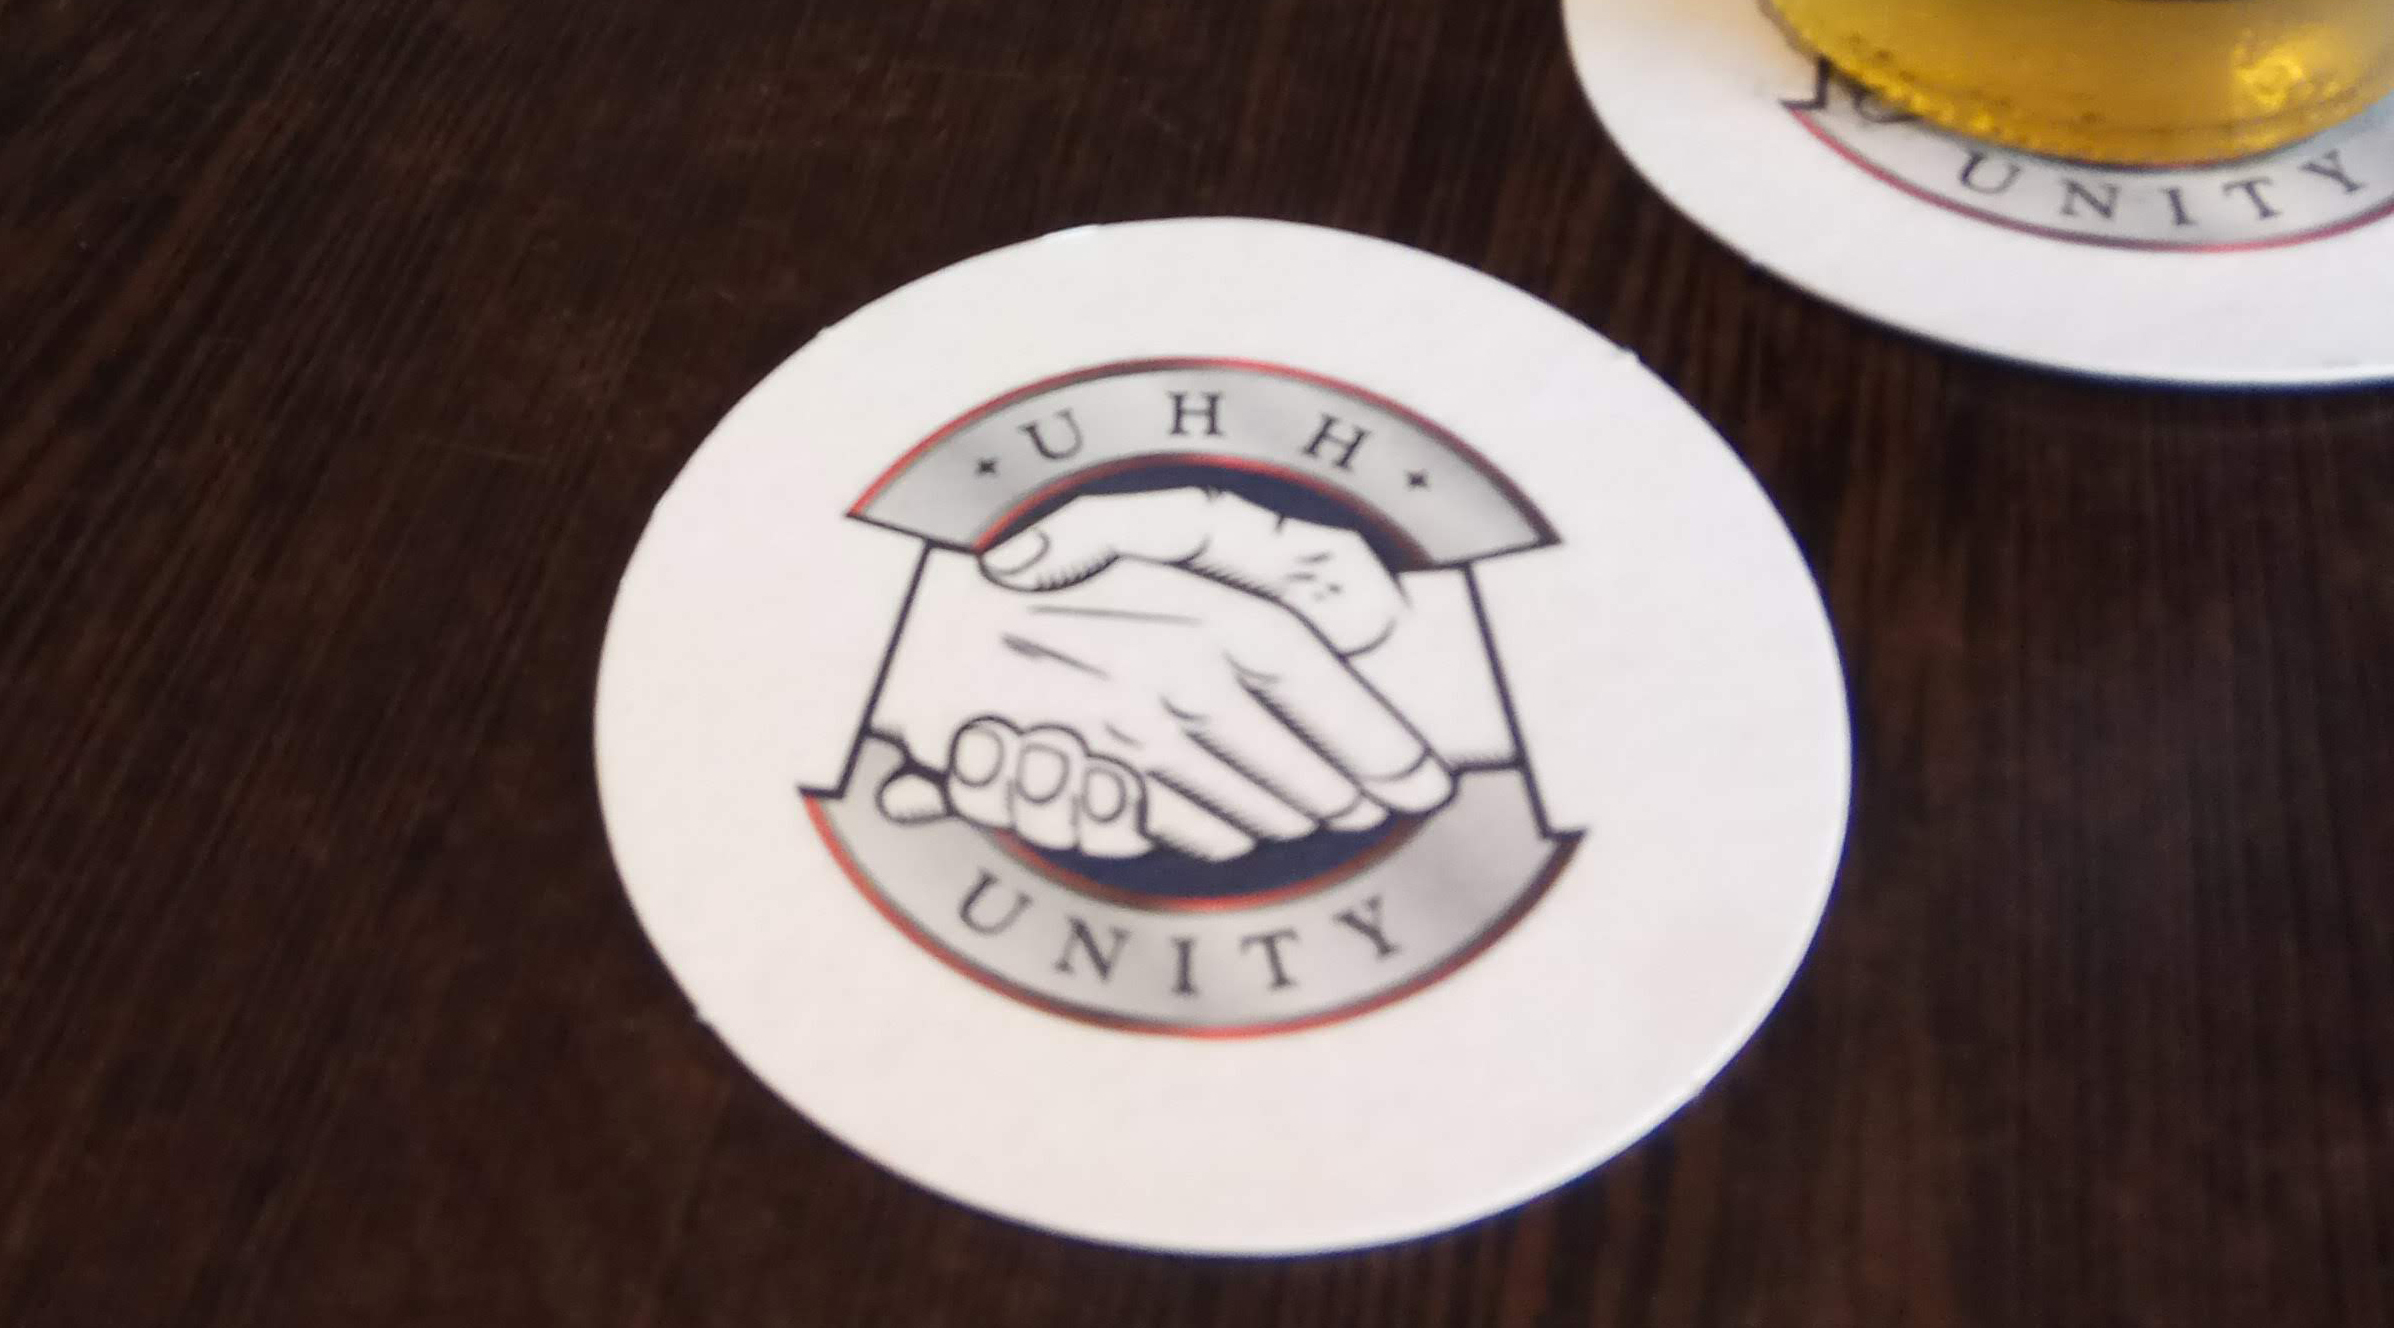 Unity_HH_coaster_t.jpg